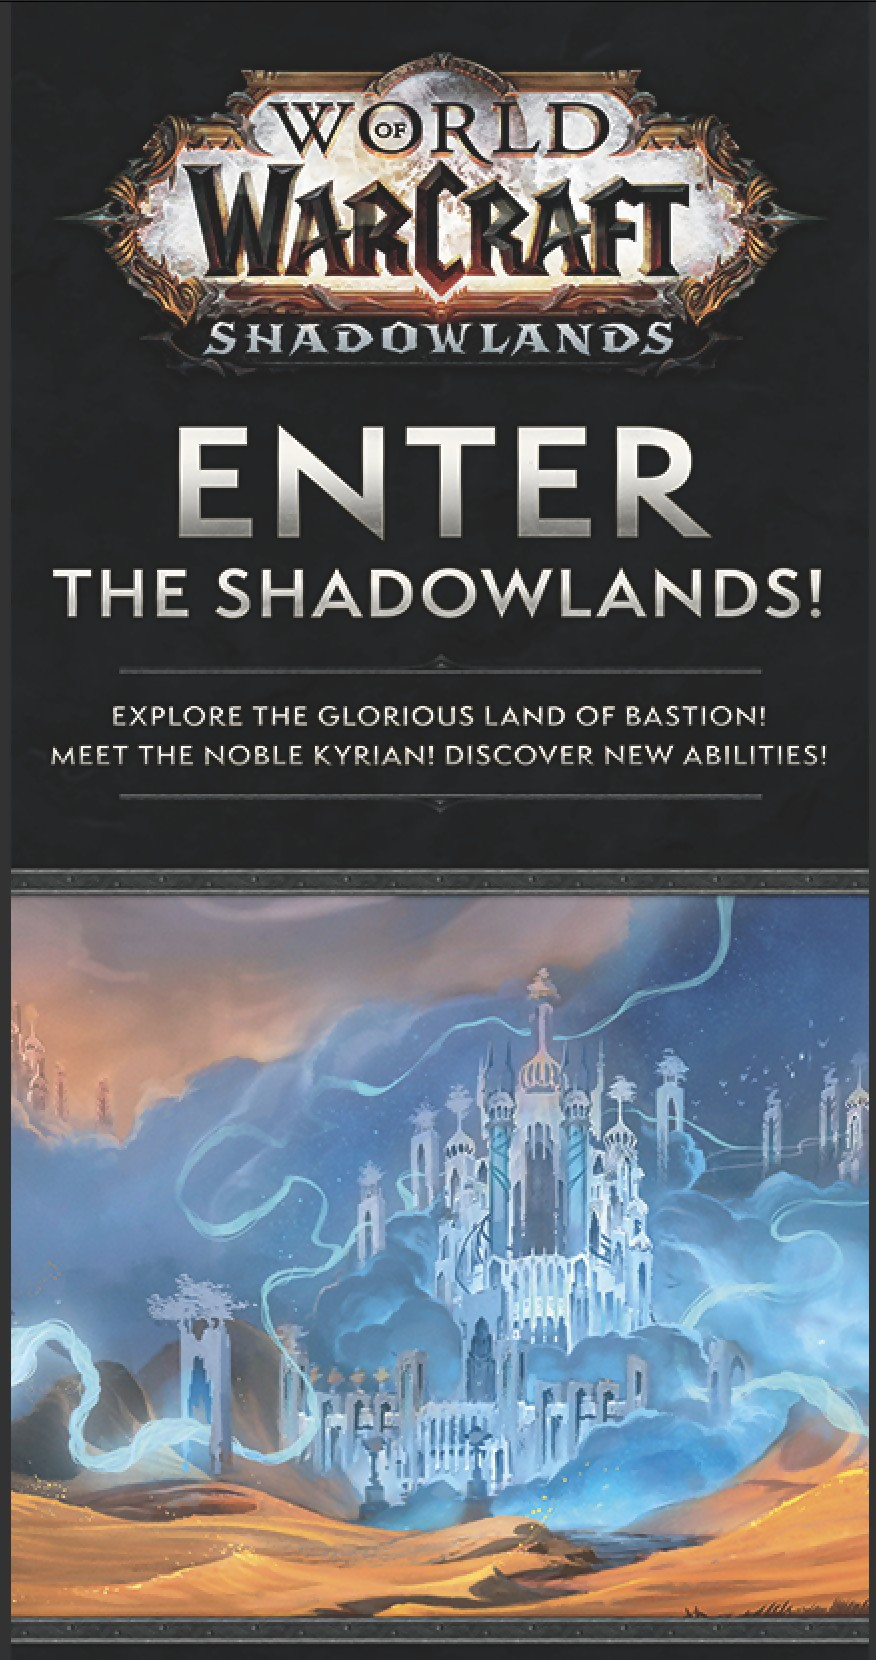 world-of-warcraft-artwork-shadowlands